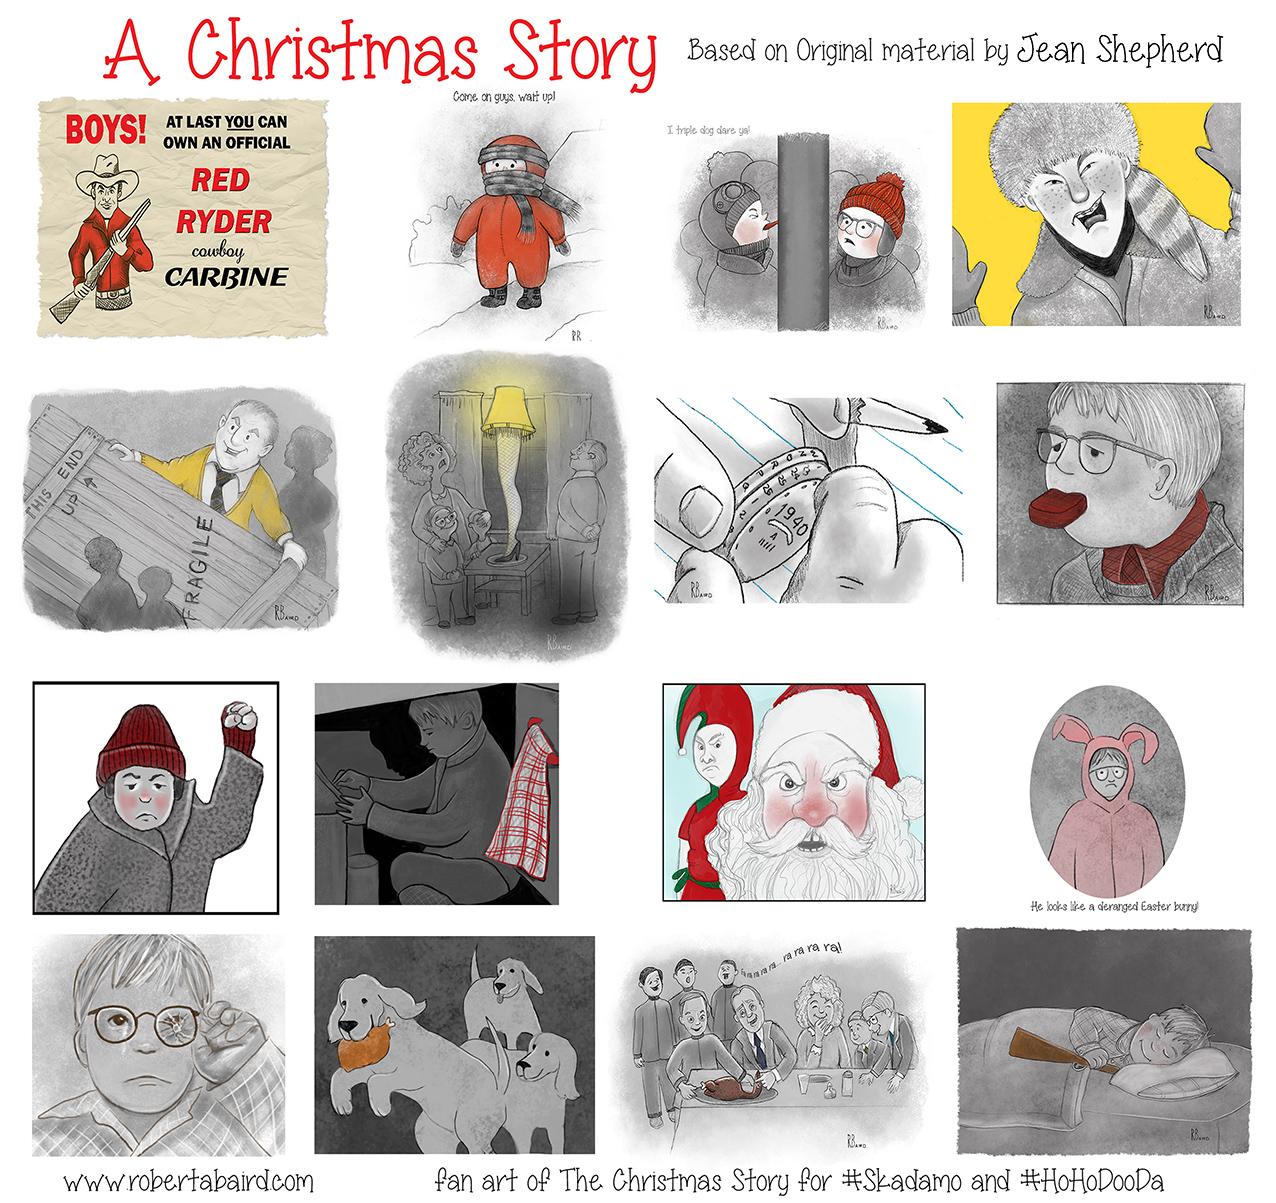 ChristmasStory_RBaird1